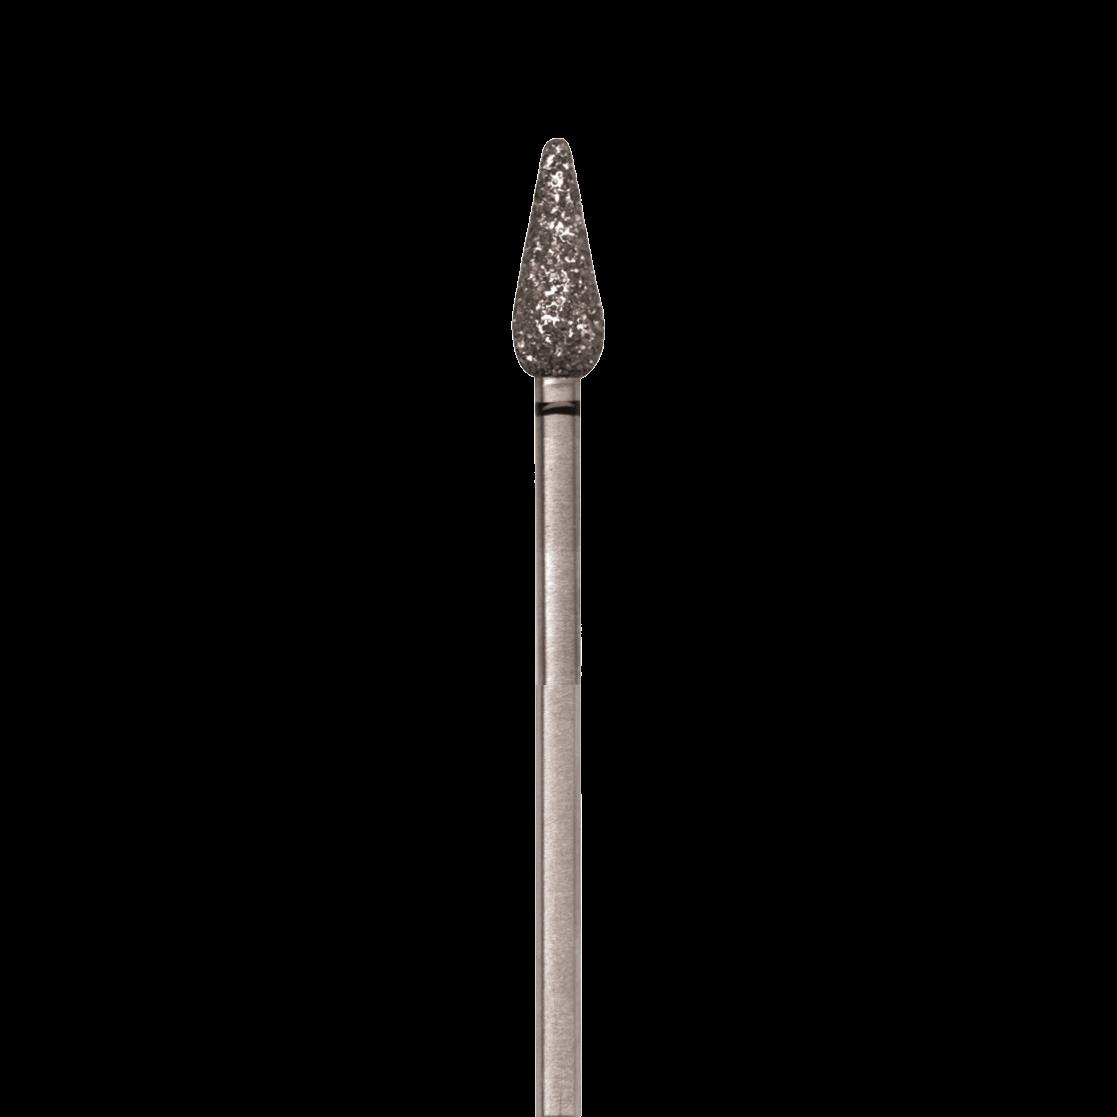 Diamantschleifer supergrob CD5893/050